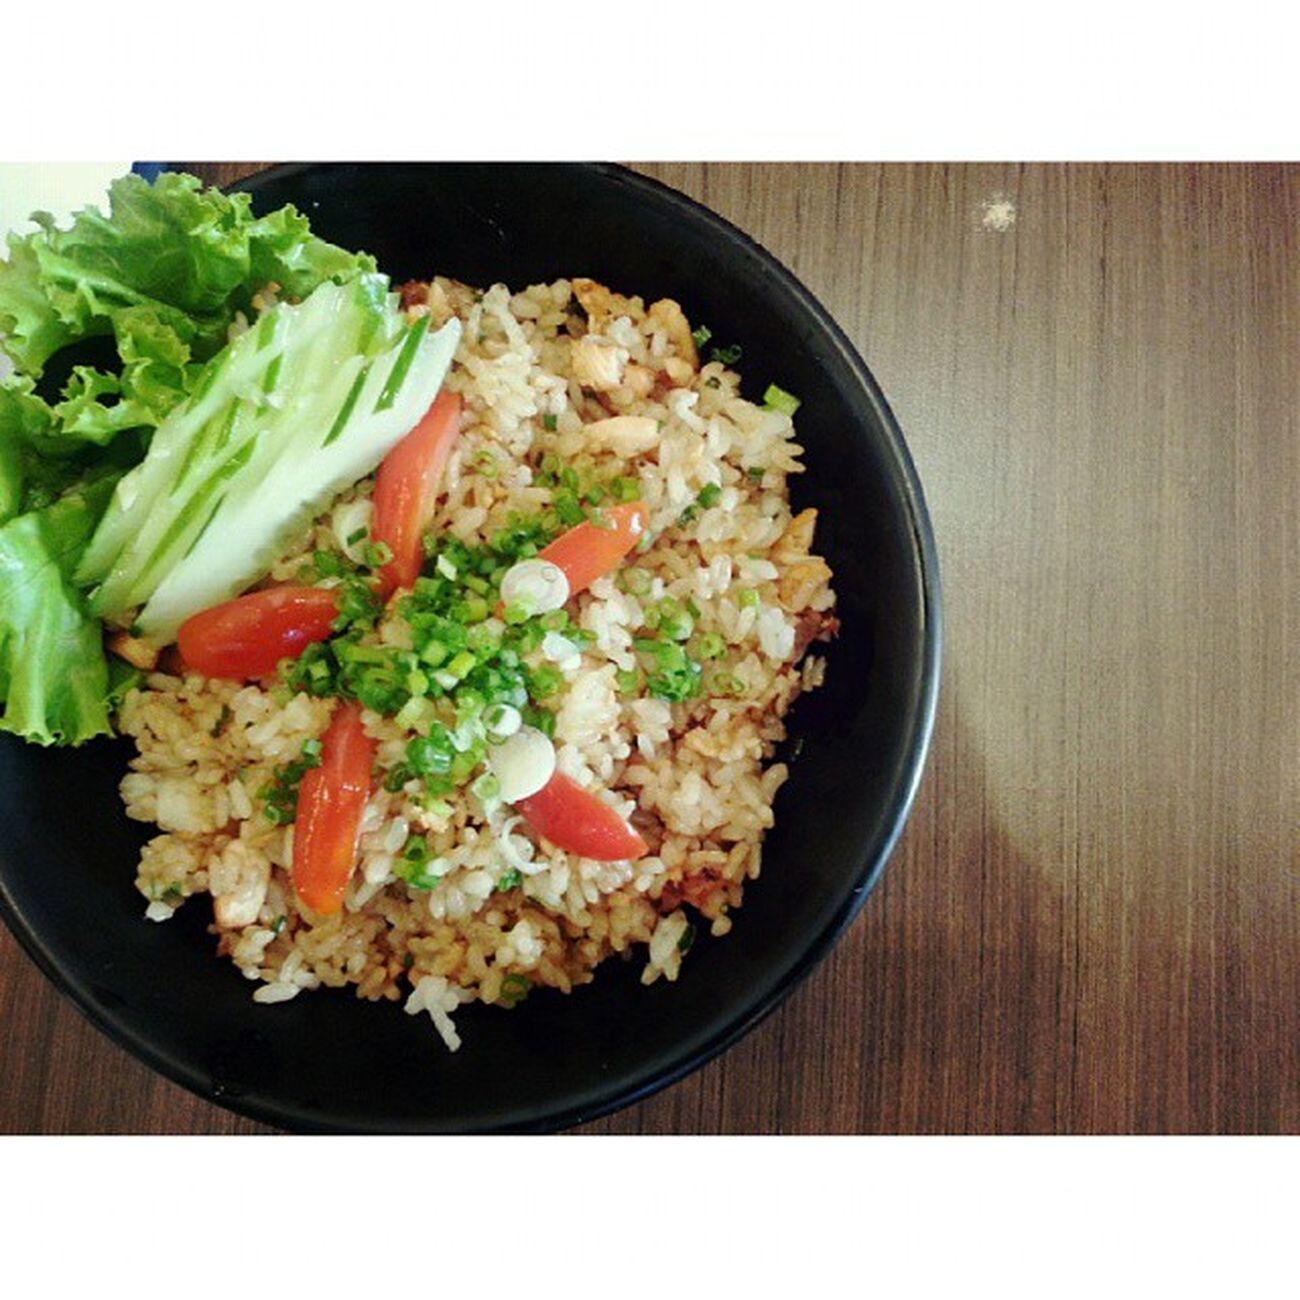 Fried Salmon Rice Sushioo Mercuryville Chitlom Japanesefood